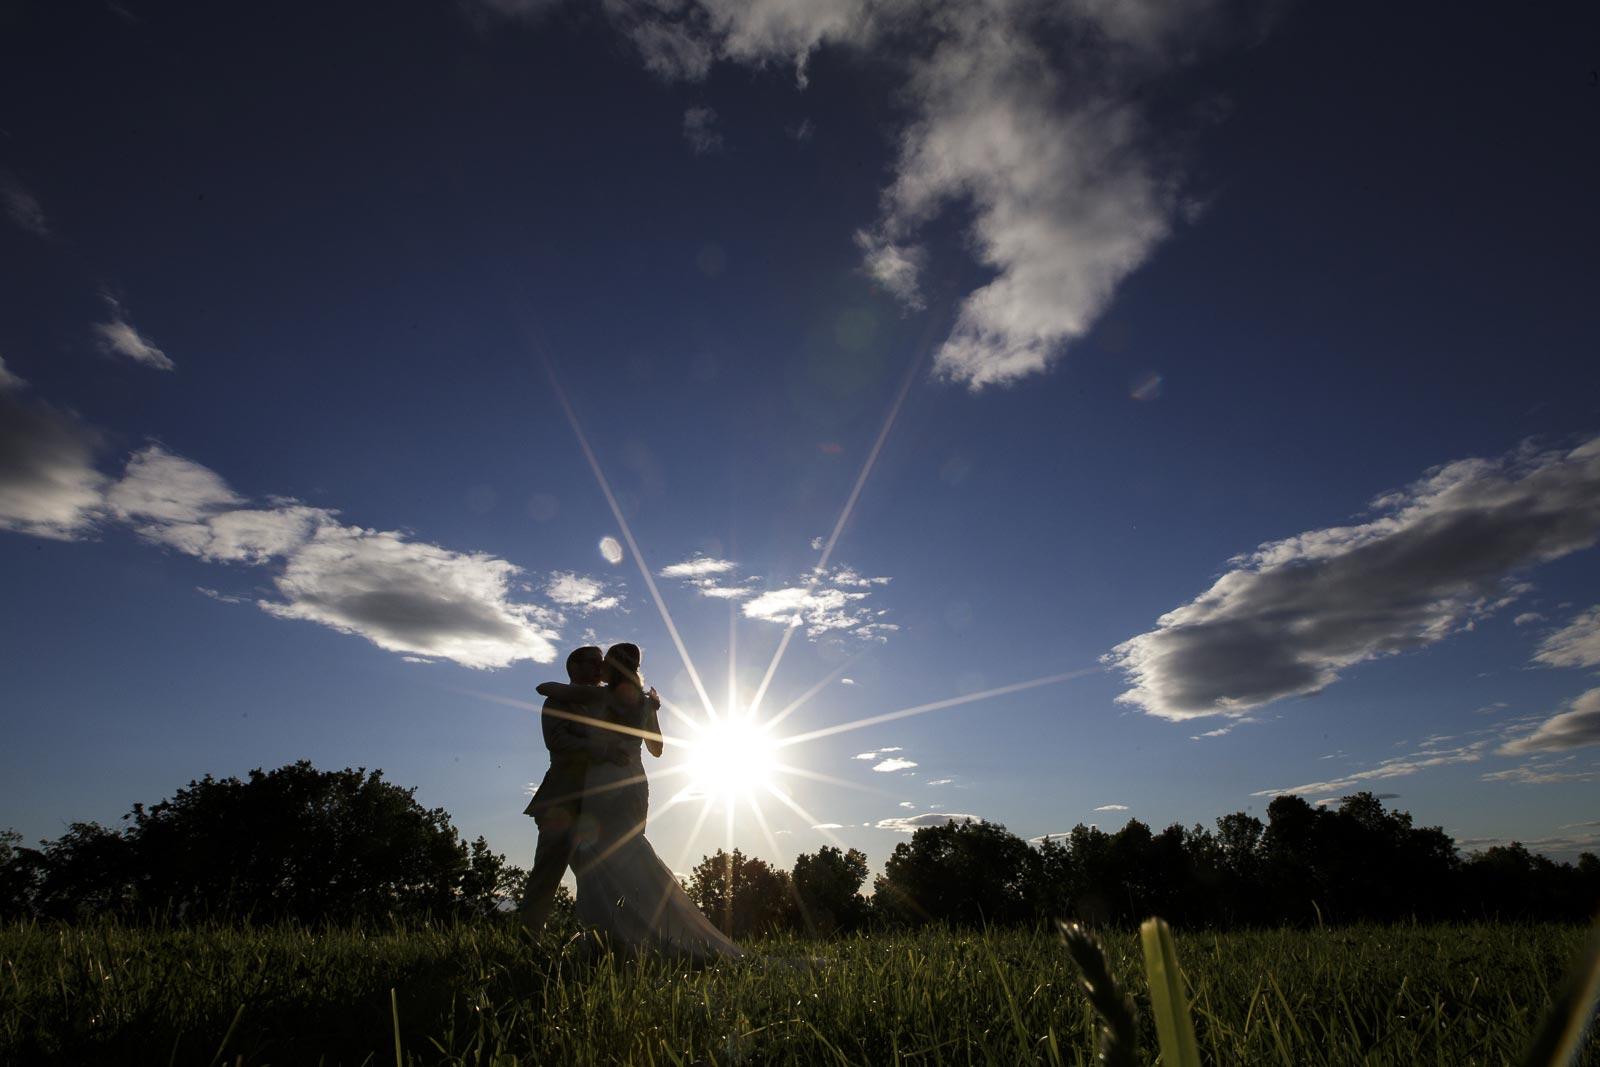 barn-at-liberty-farms-wedding-hudson-valley-alekseyk-photography-50.jpg